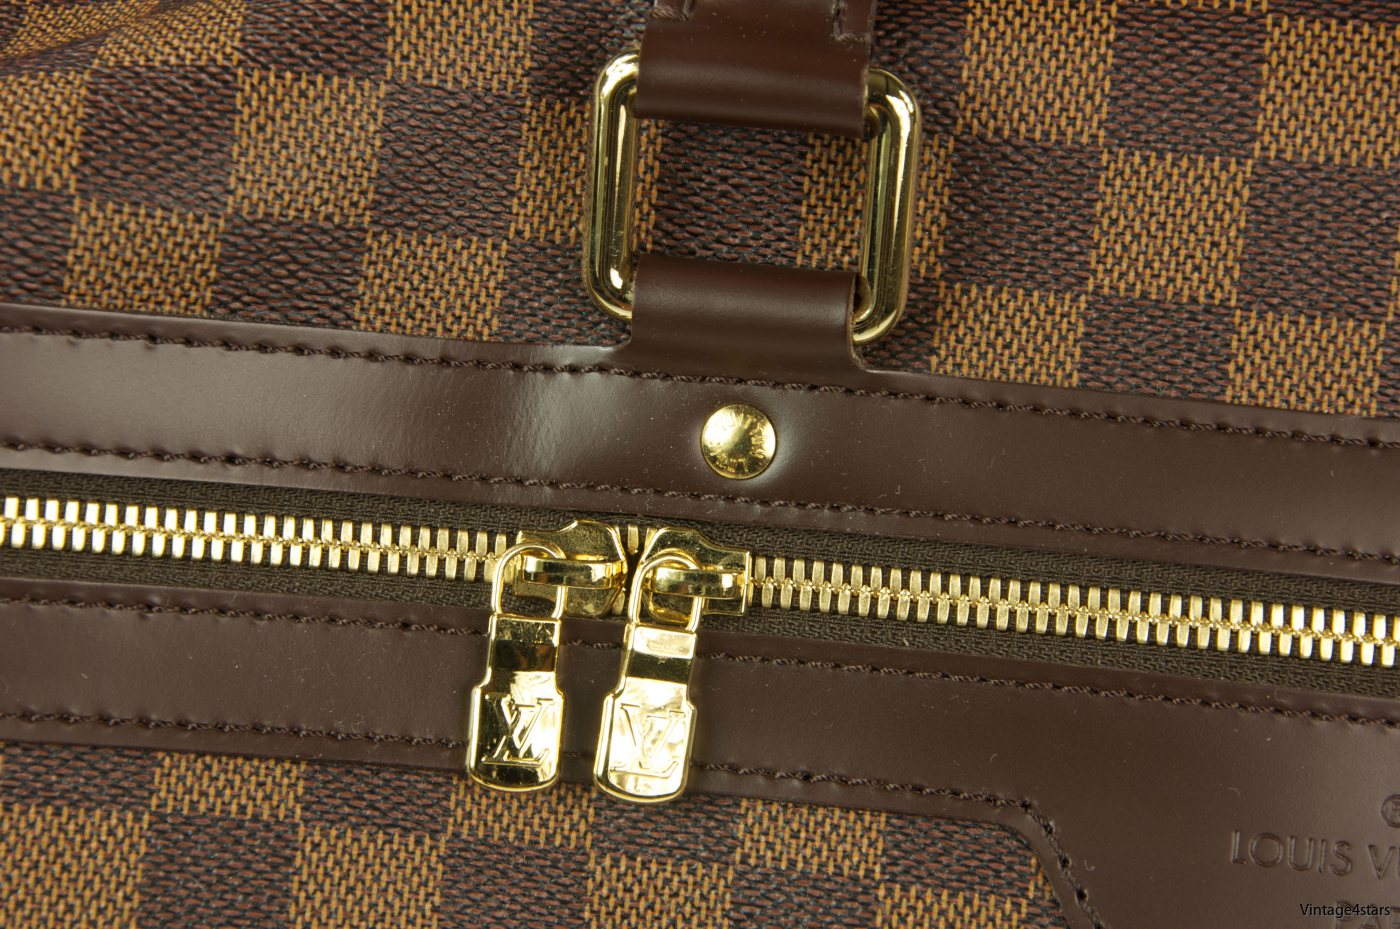 Louis Vuitton Eole 5